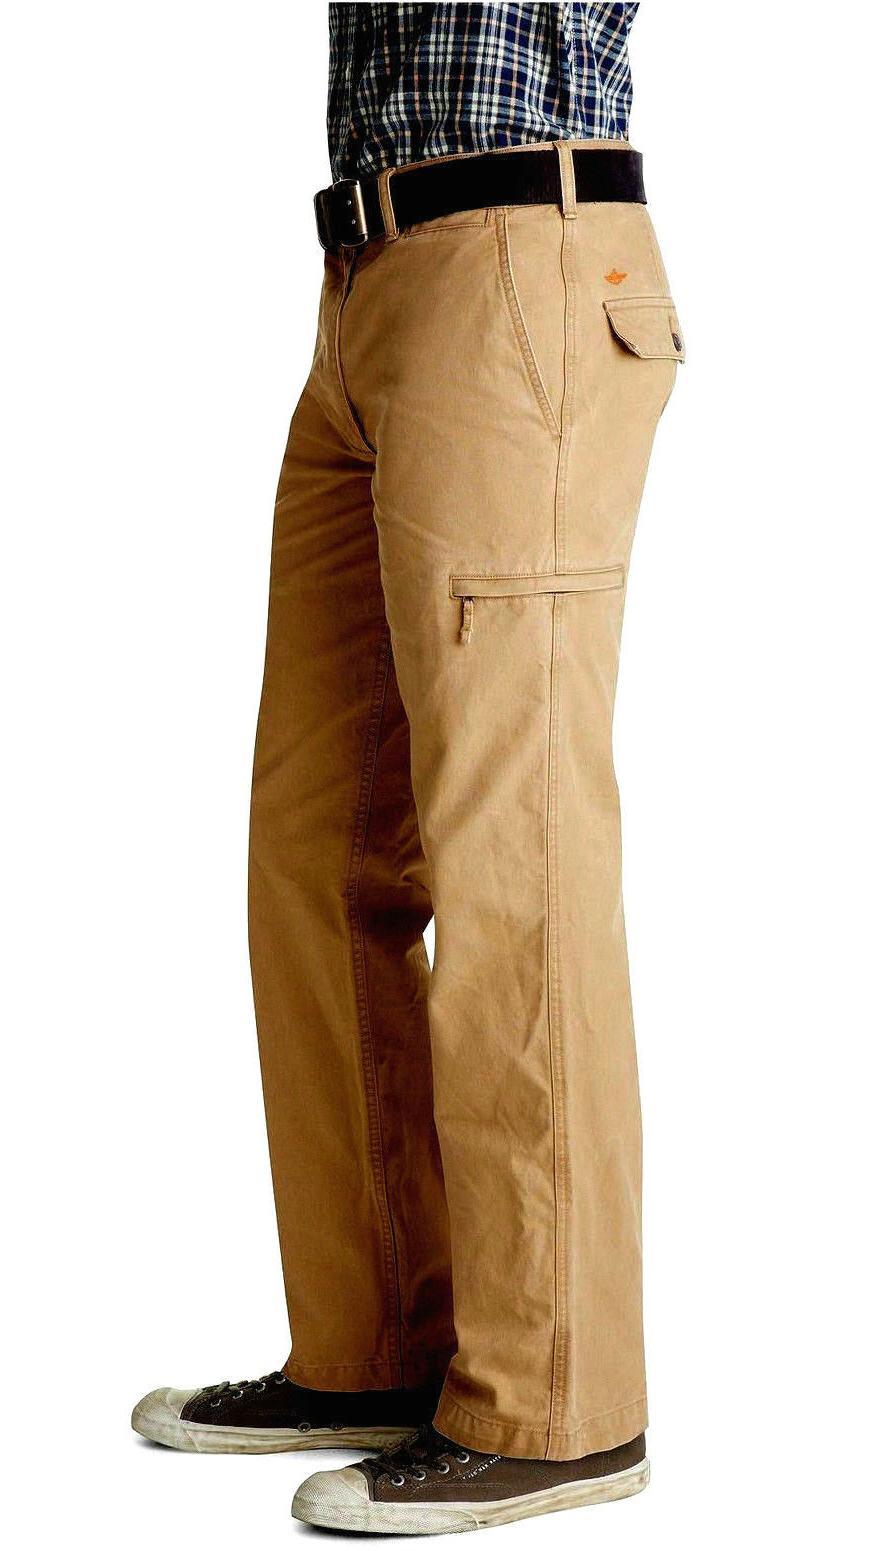 Dockers Cargo Pants 38x30 D3 Classic Fit Khaki Pockets NWT